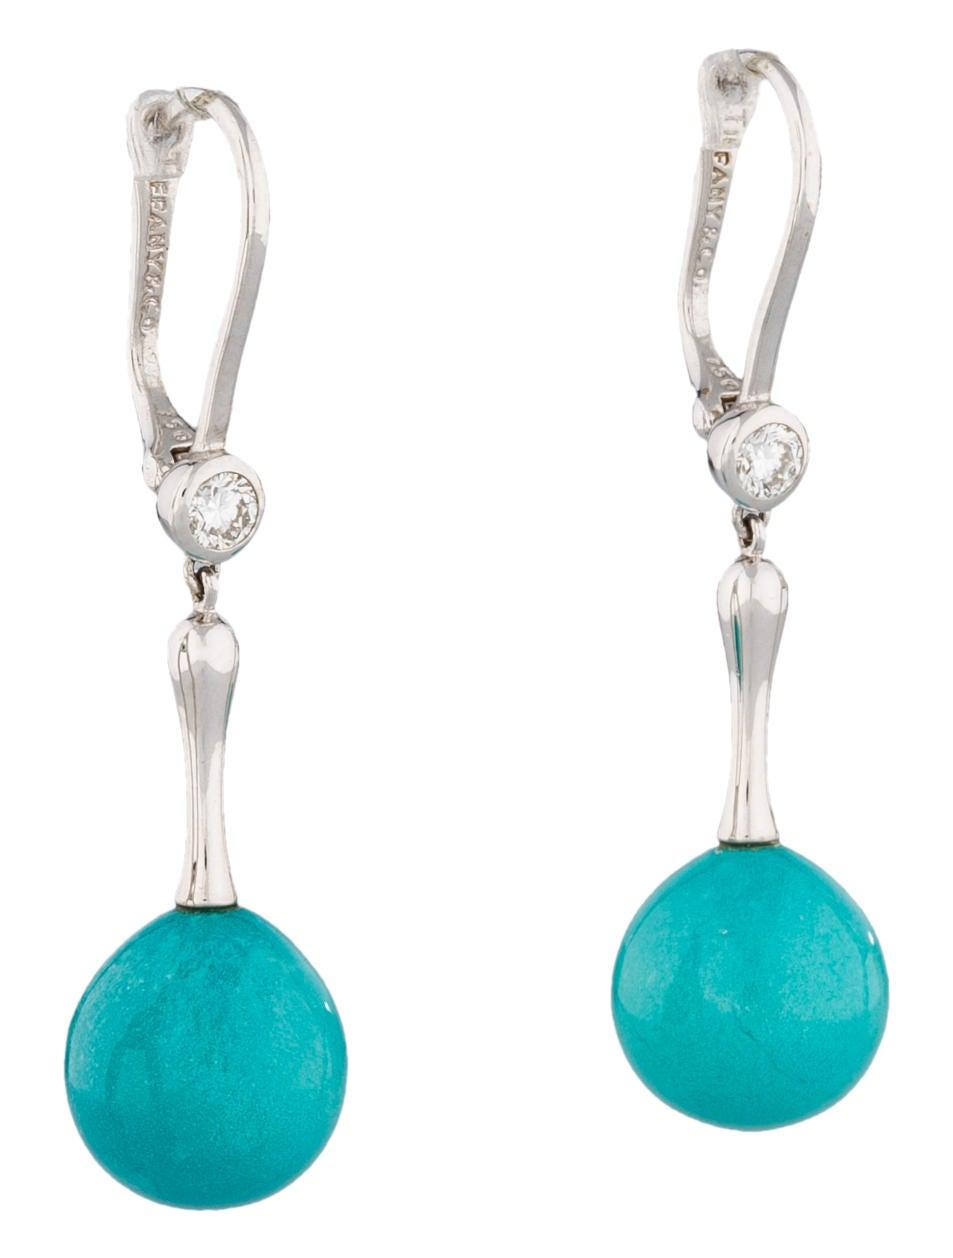 Turquoise And Diamond Drop Earrings